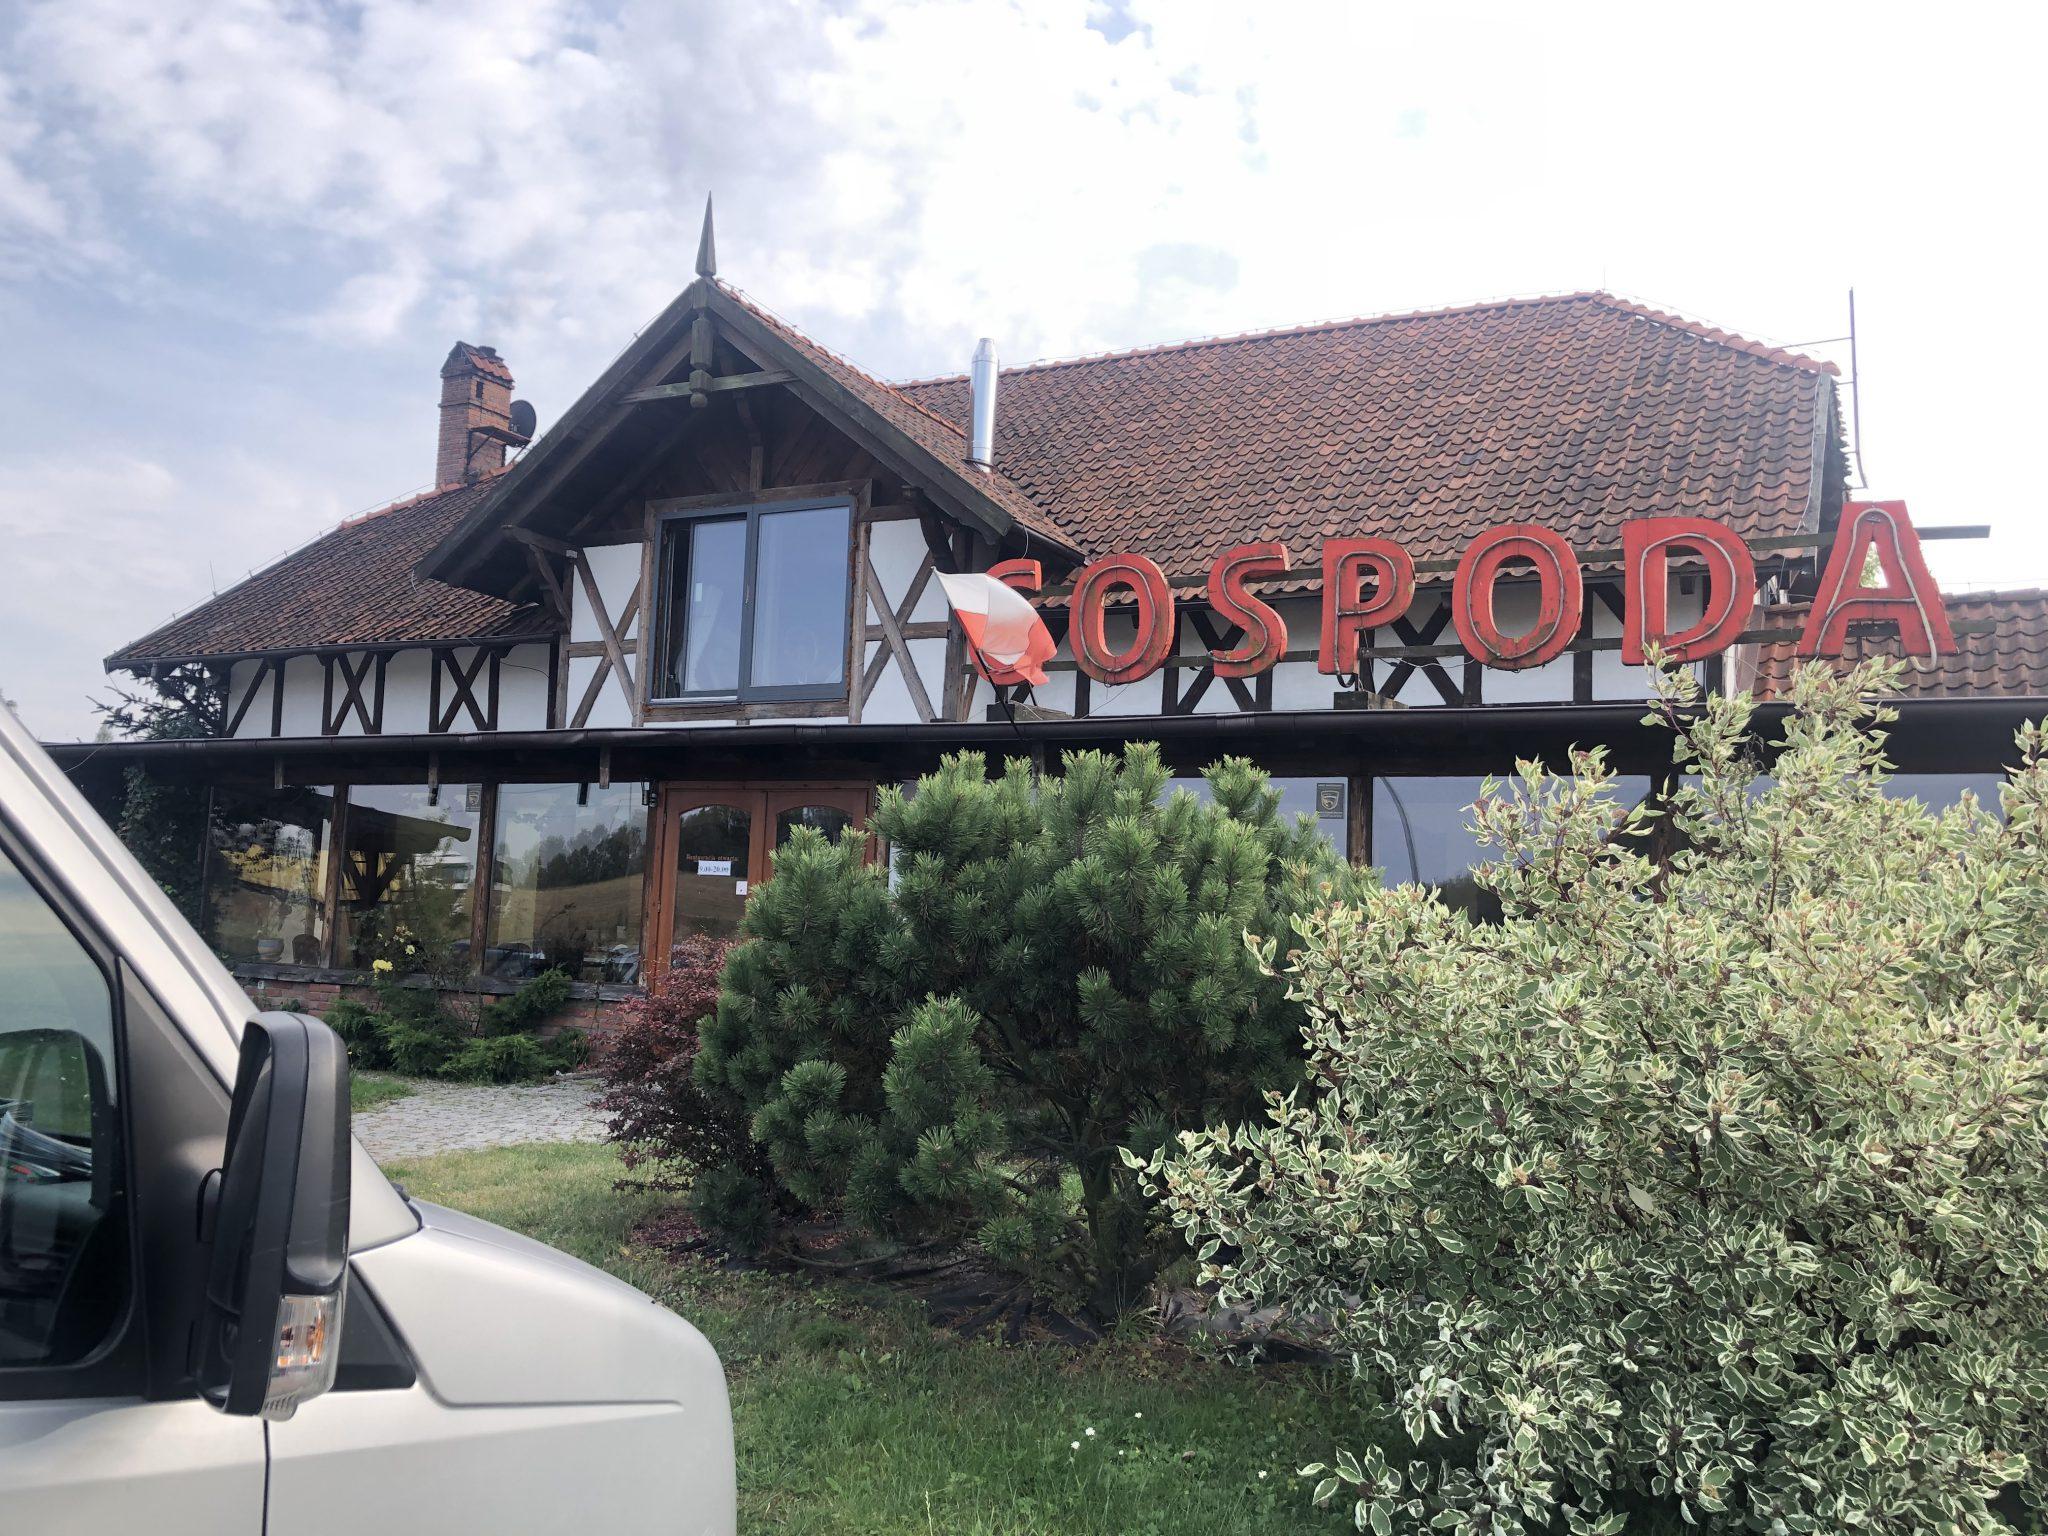 Das Restaurant Gospoda in Polen